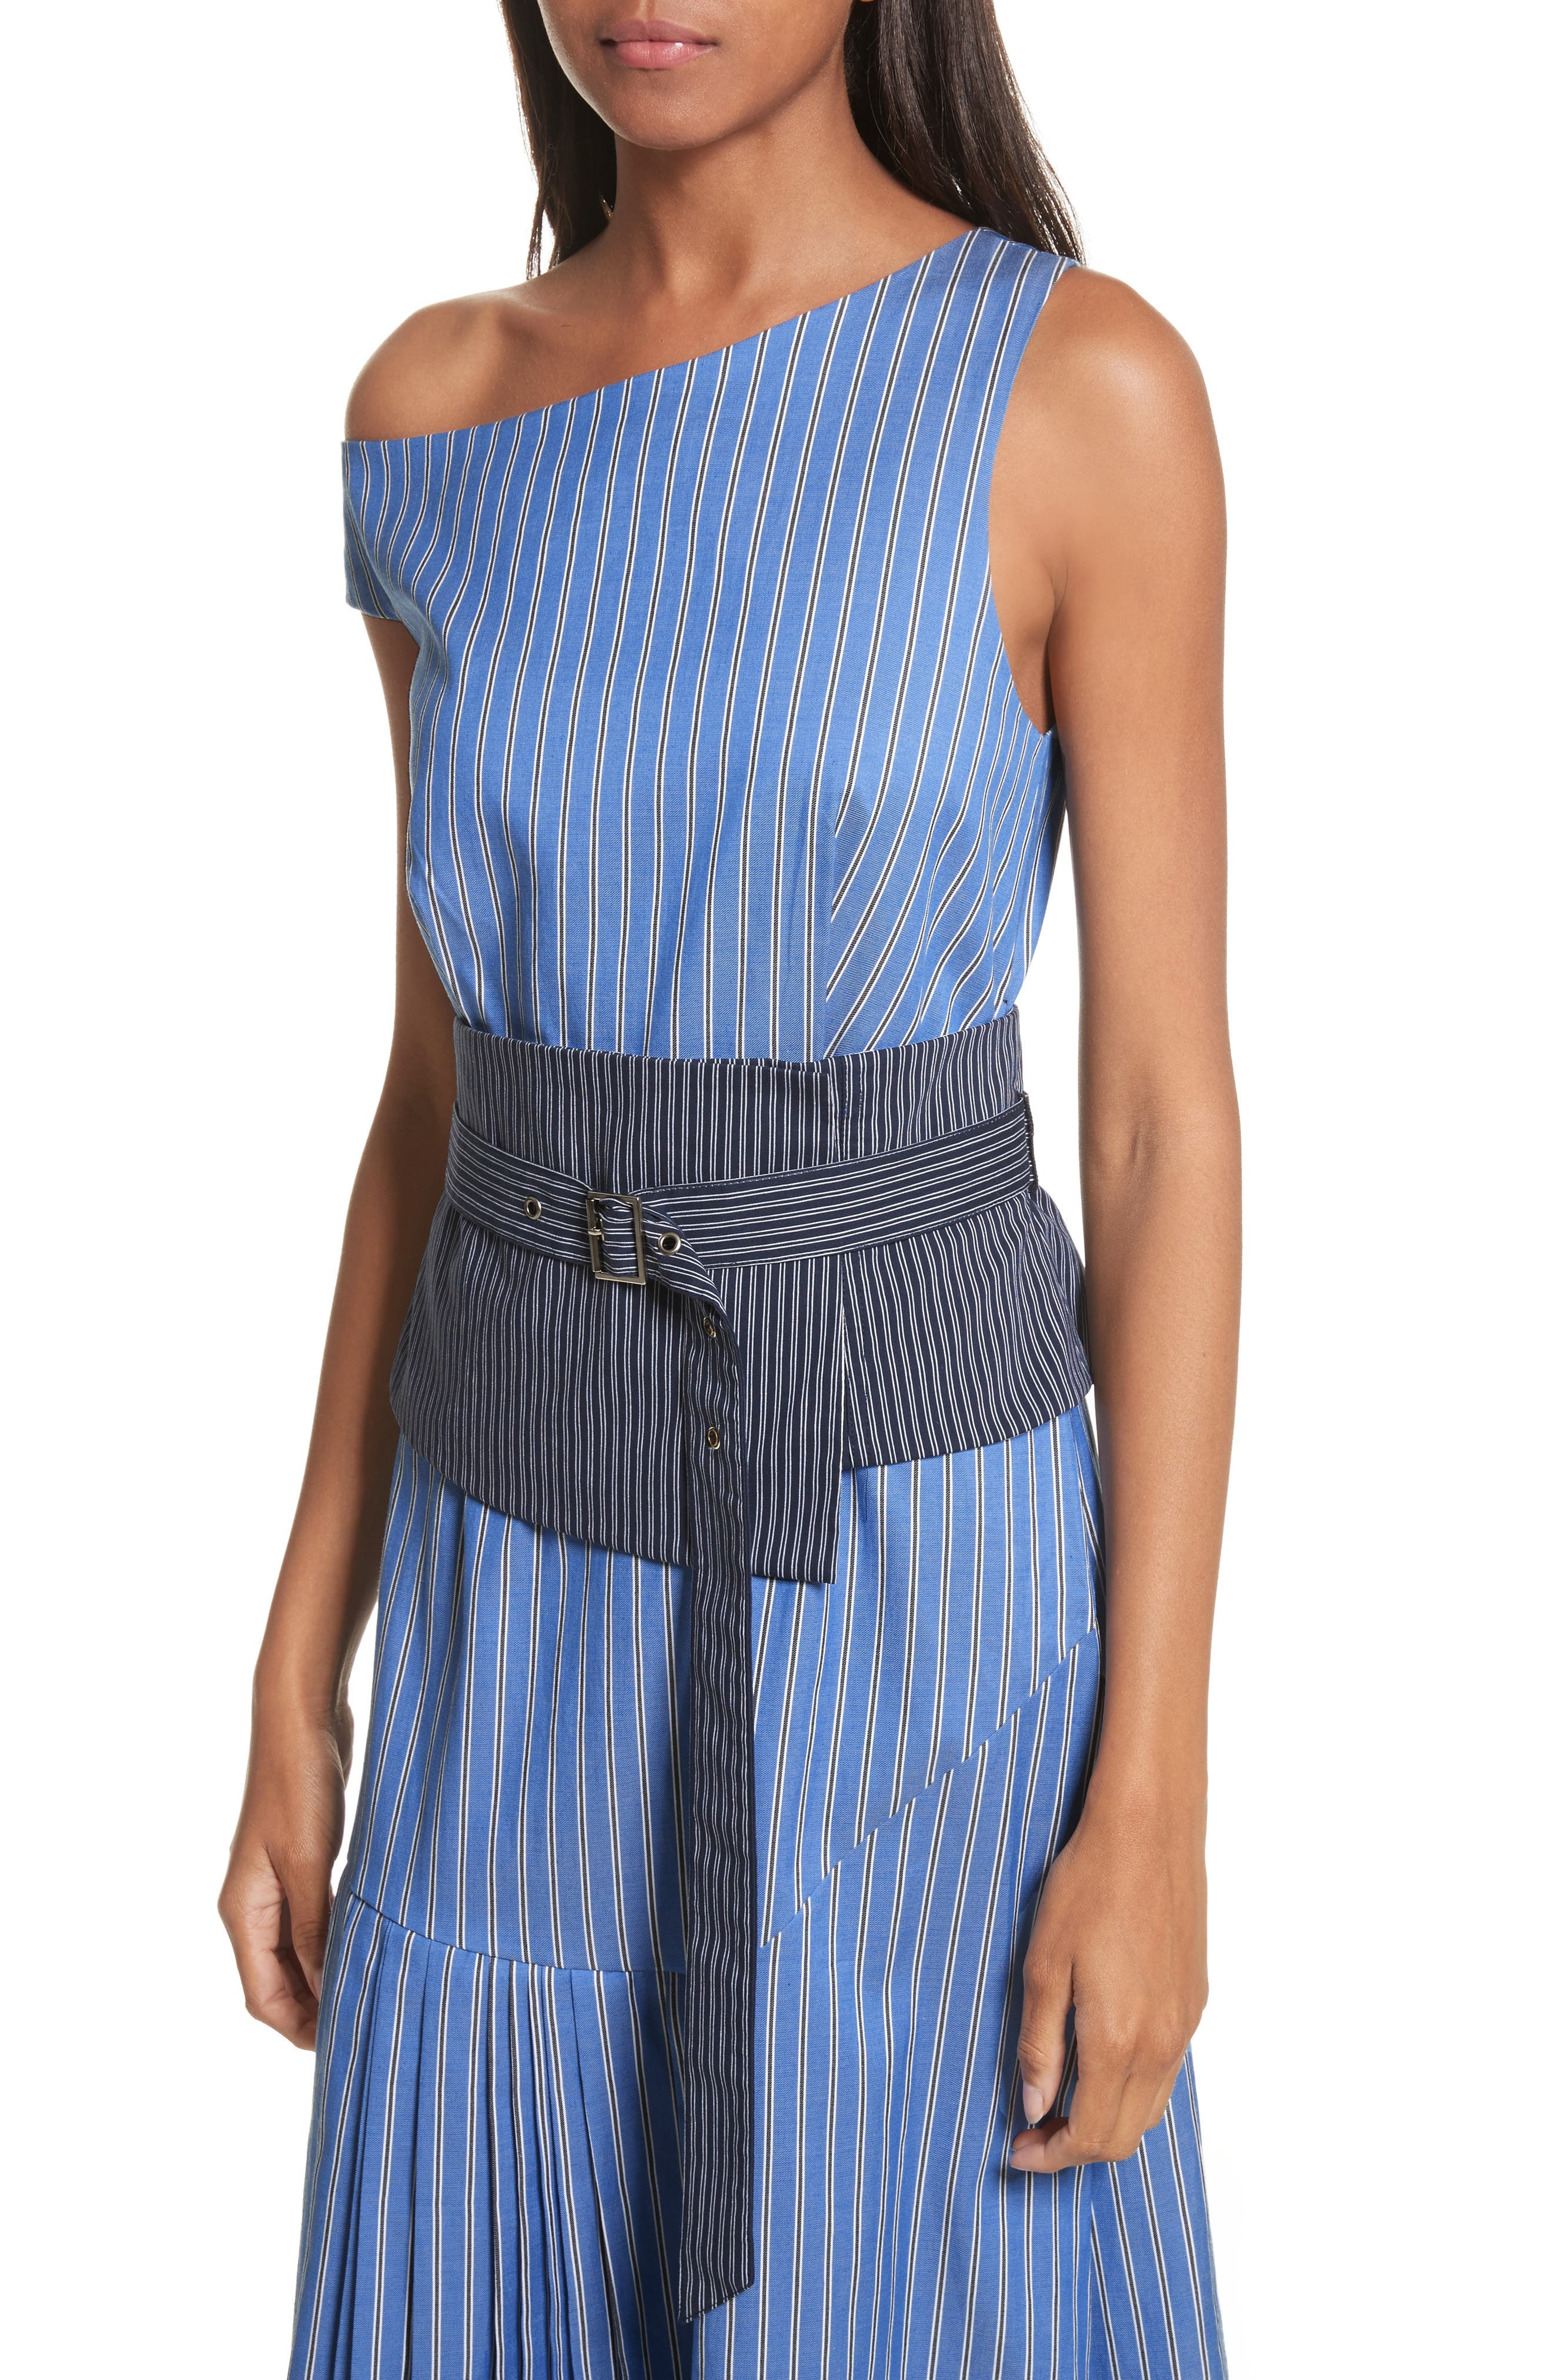 Belted Asymmetrical Midi Dress,                             Alternate thumbnail 4, color,                             402